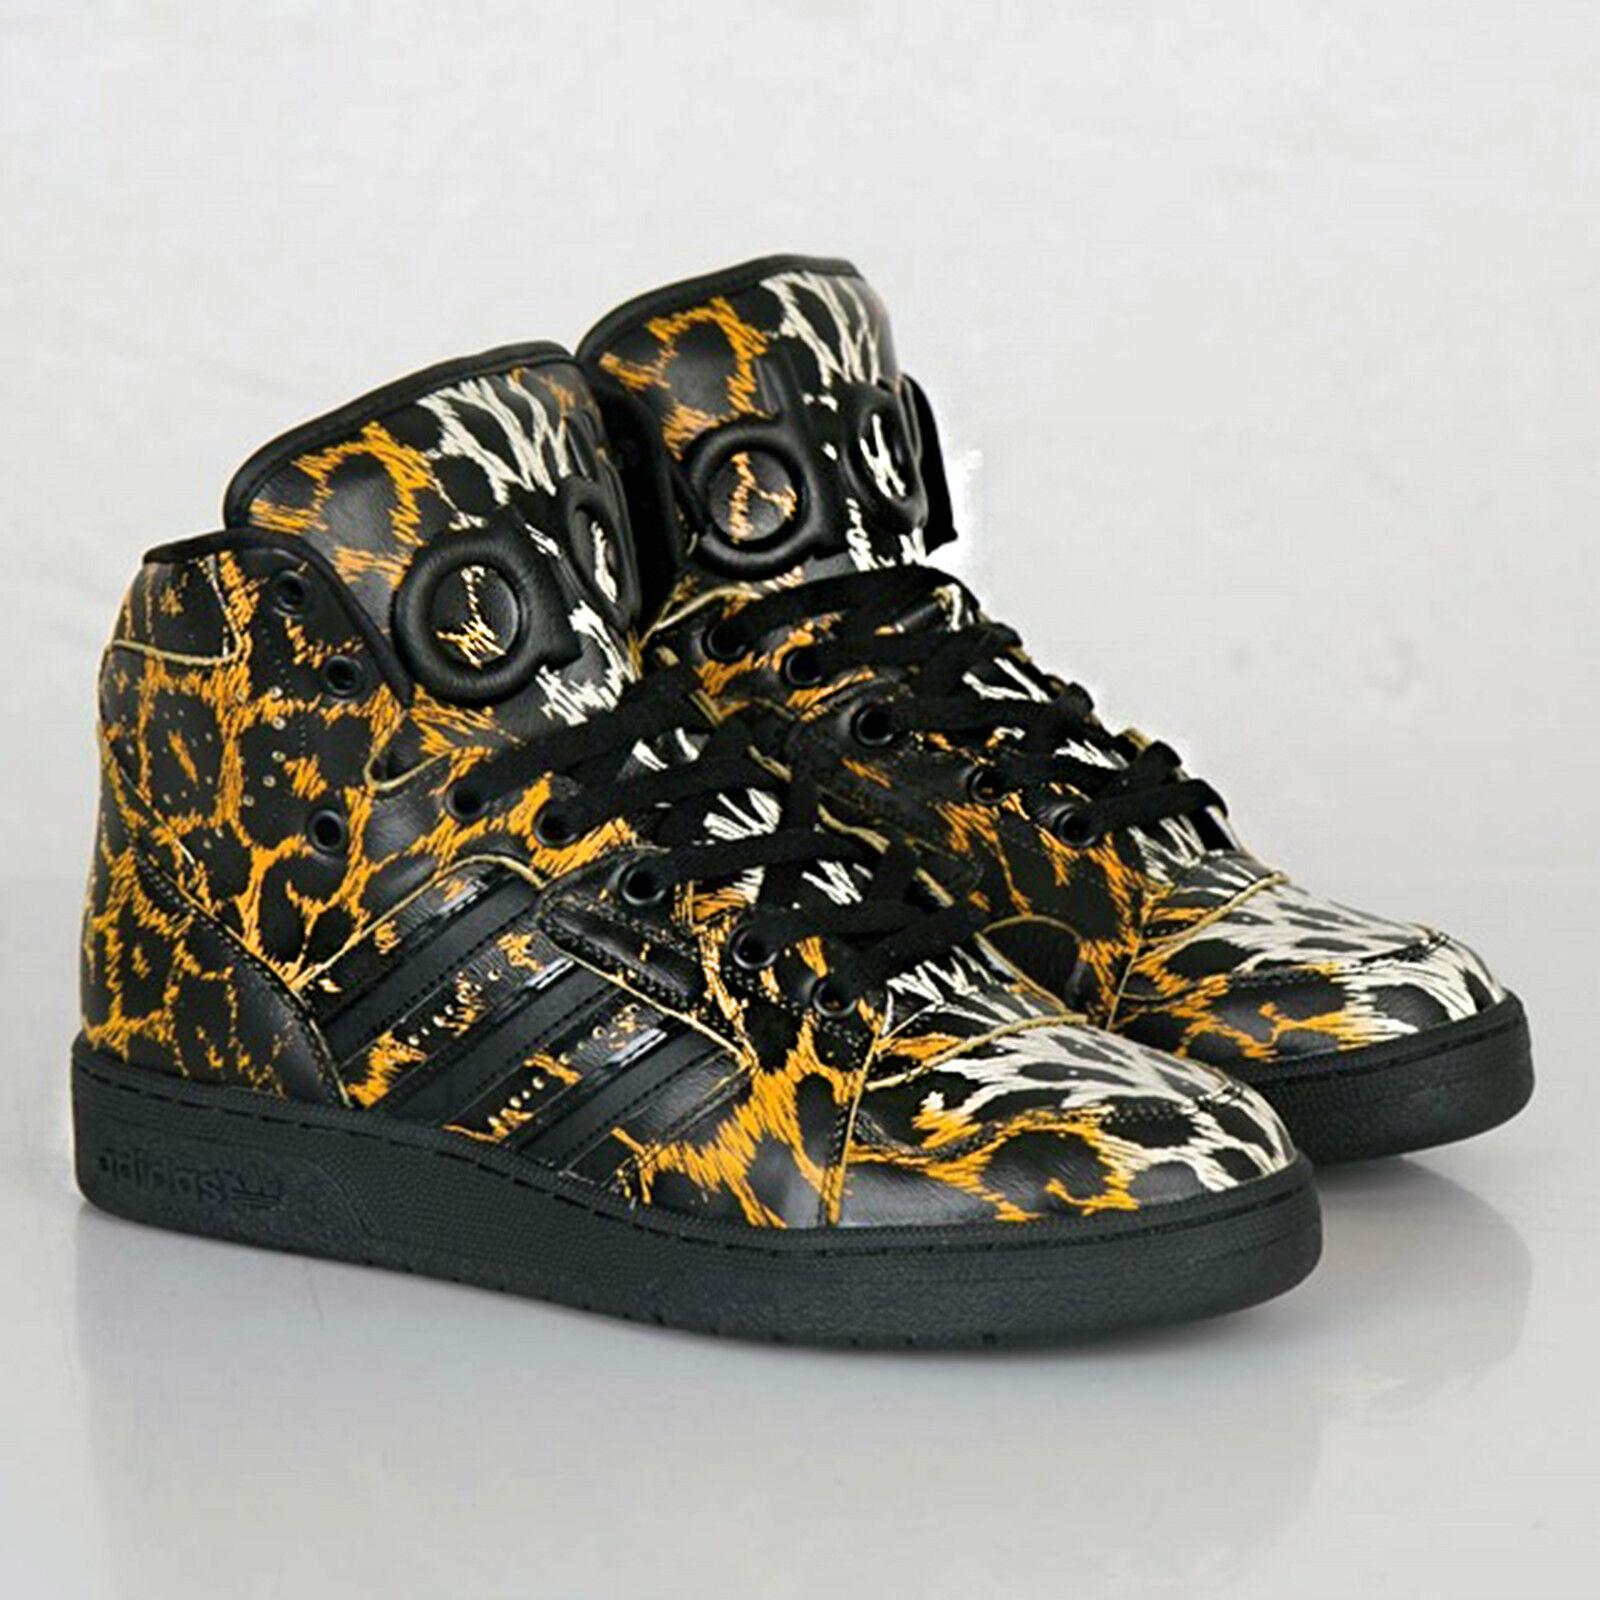 Adidas Zapatos  caballero Jeremy Scott 37 42 38 39 40 41 42 37 43 4,5 6,5 8,5 8 9,5 Zapatos d4a7d9